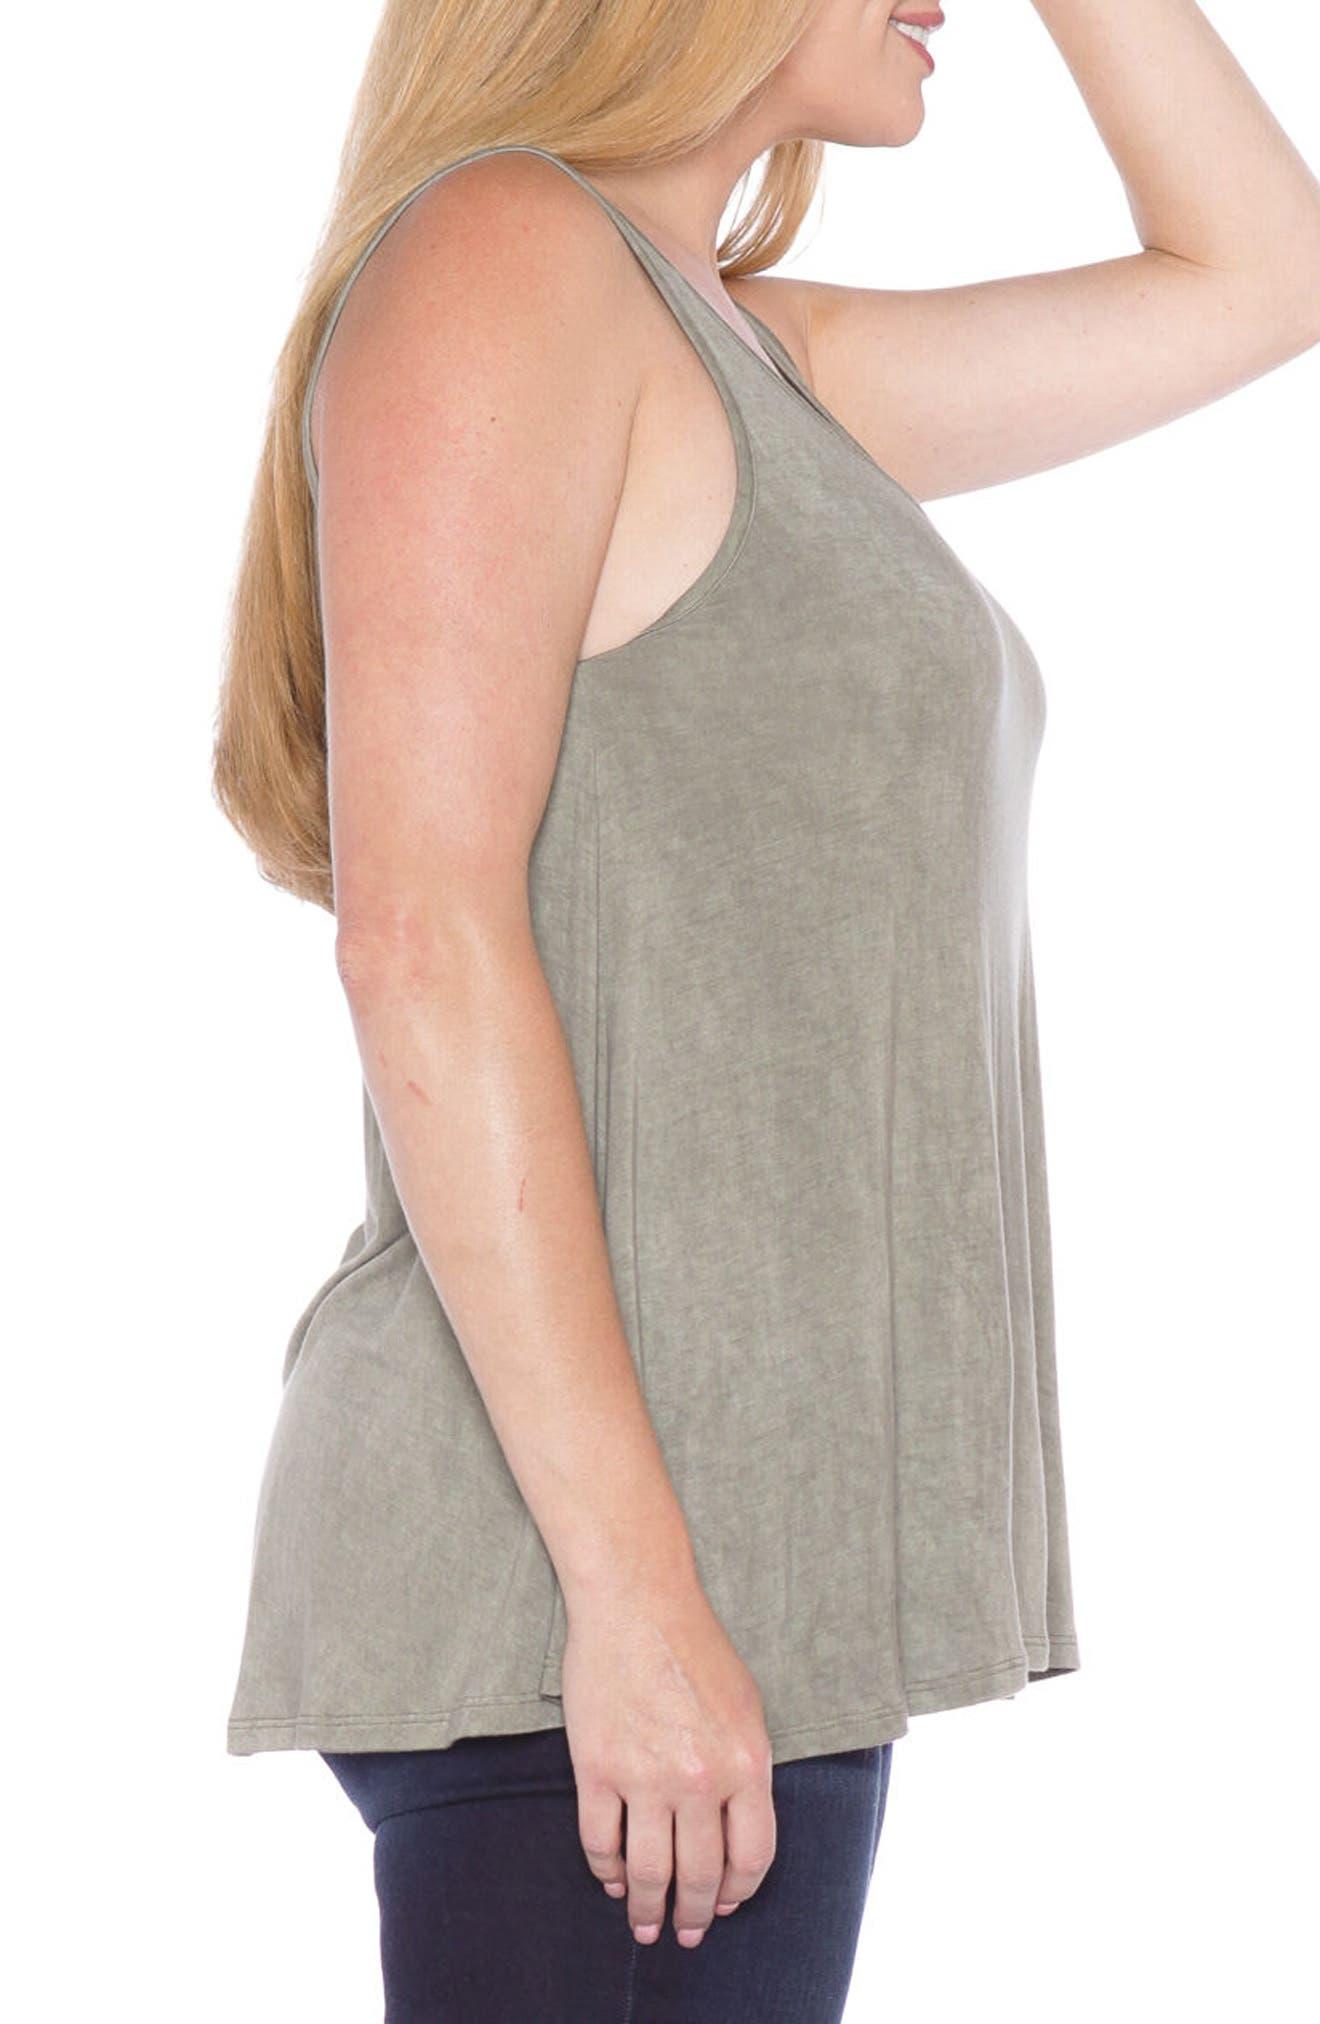 Alternate Image 3  - SLINK Jeans Scoop Neck Tank Top (Plus Size)